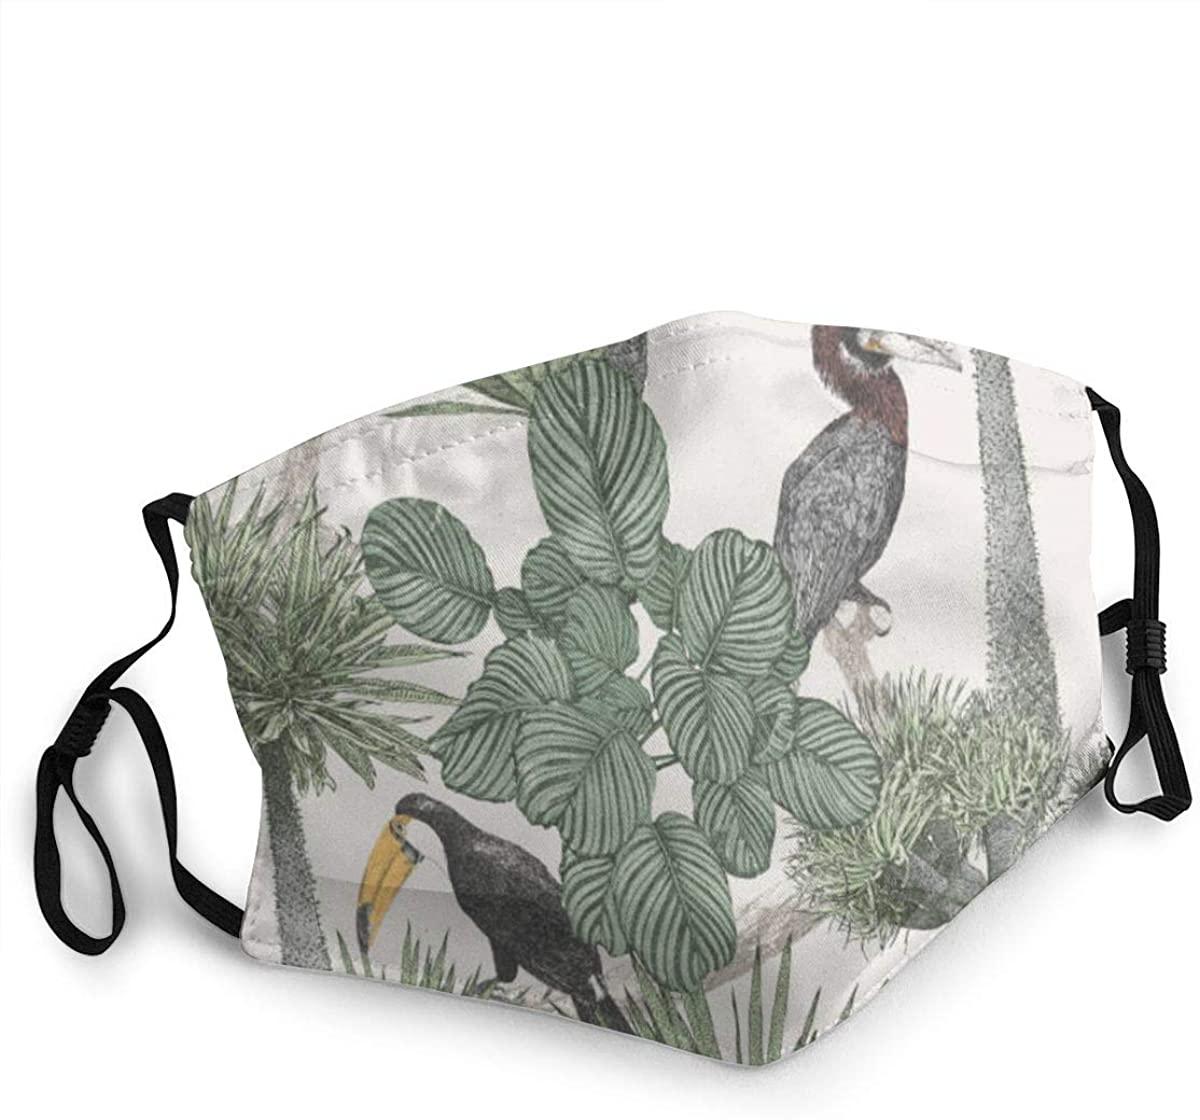 Fashion Protective Face Masks, Tropical Birds Palm Trees Unisex Dust Mouth Masks, Washable, Reusable Masks